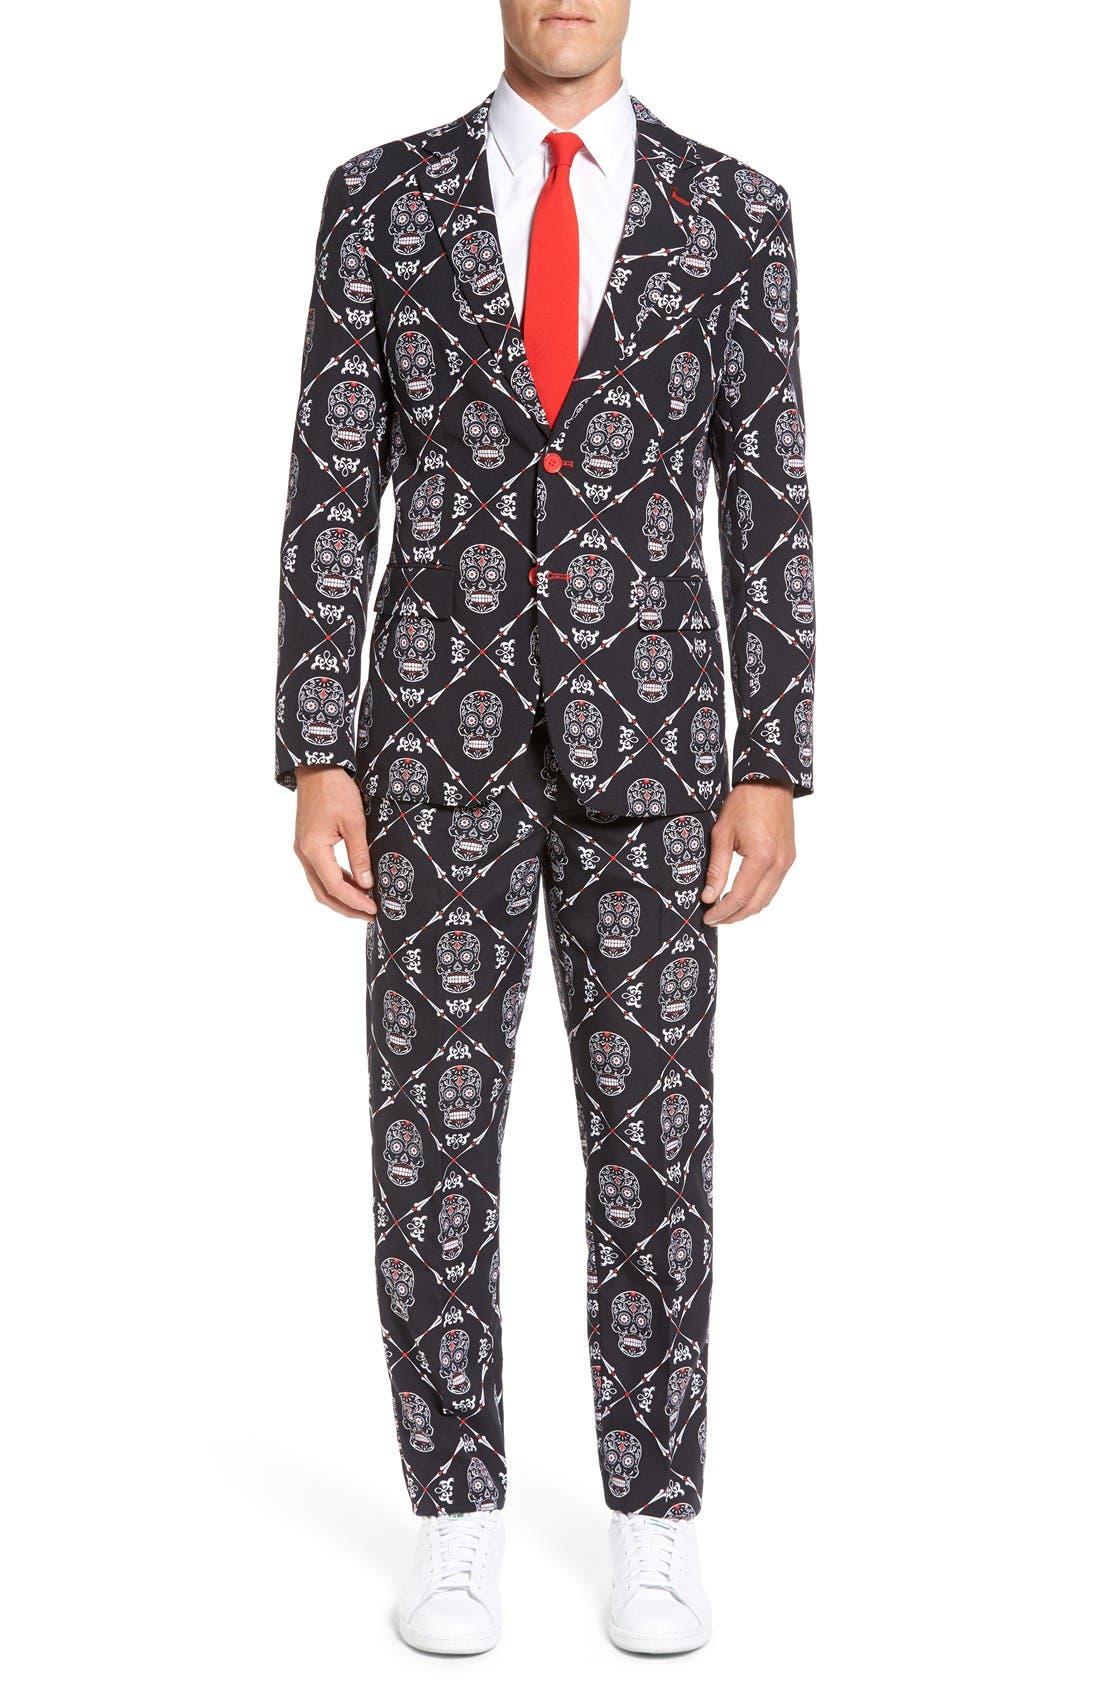 'Haunting Hombre' Trim Fit Suit with Tie,                         Main,                         color, 001